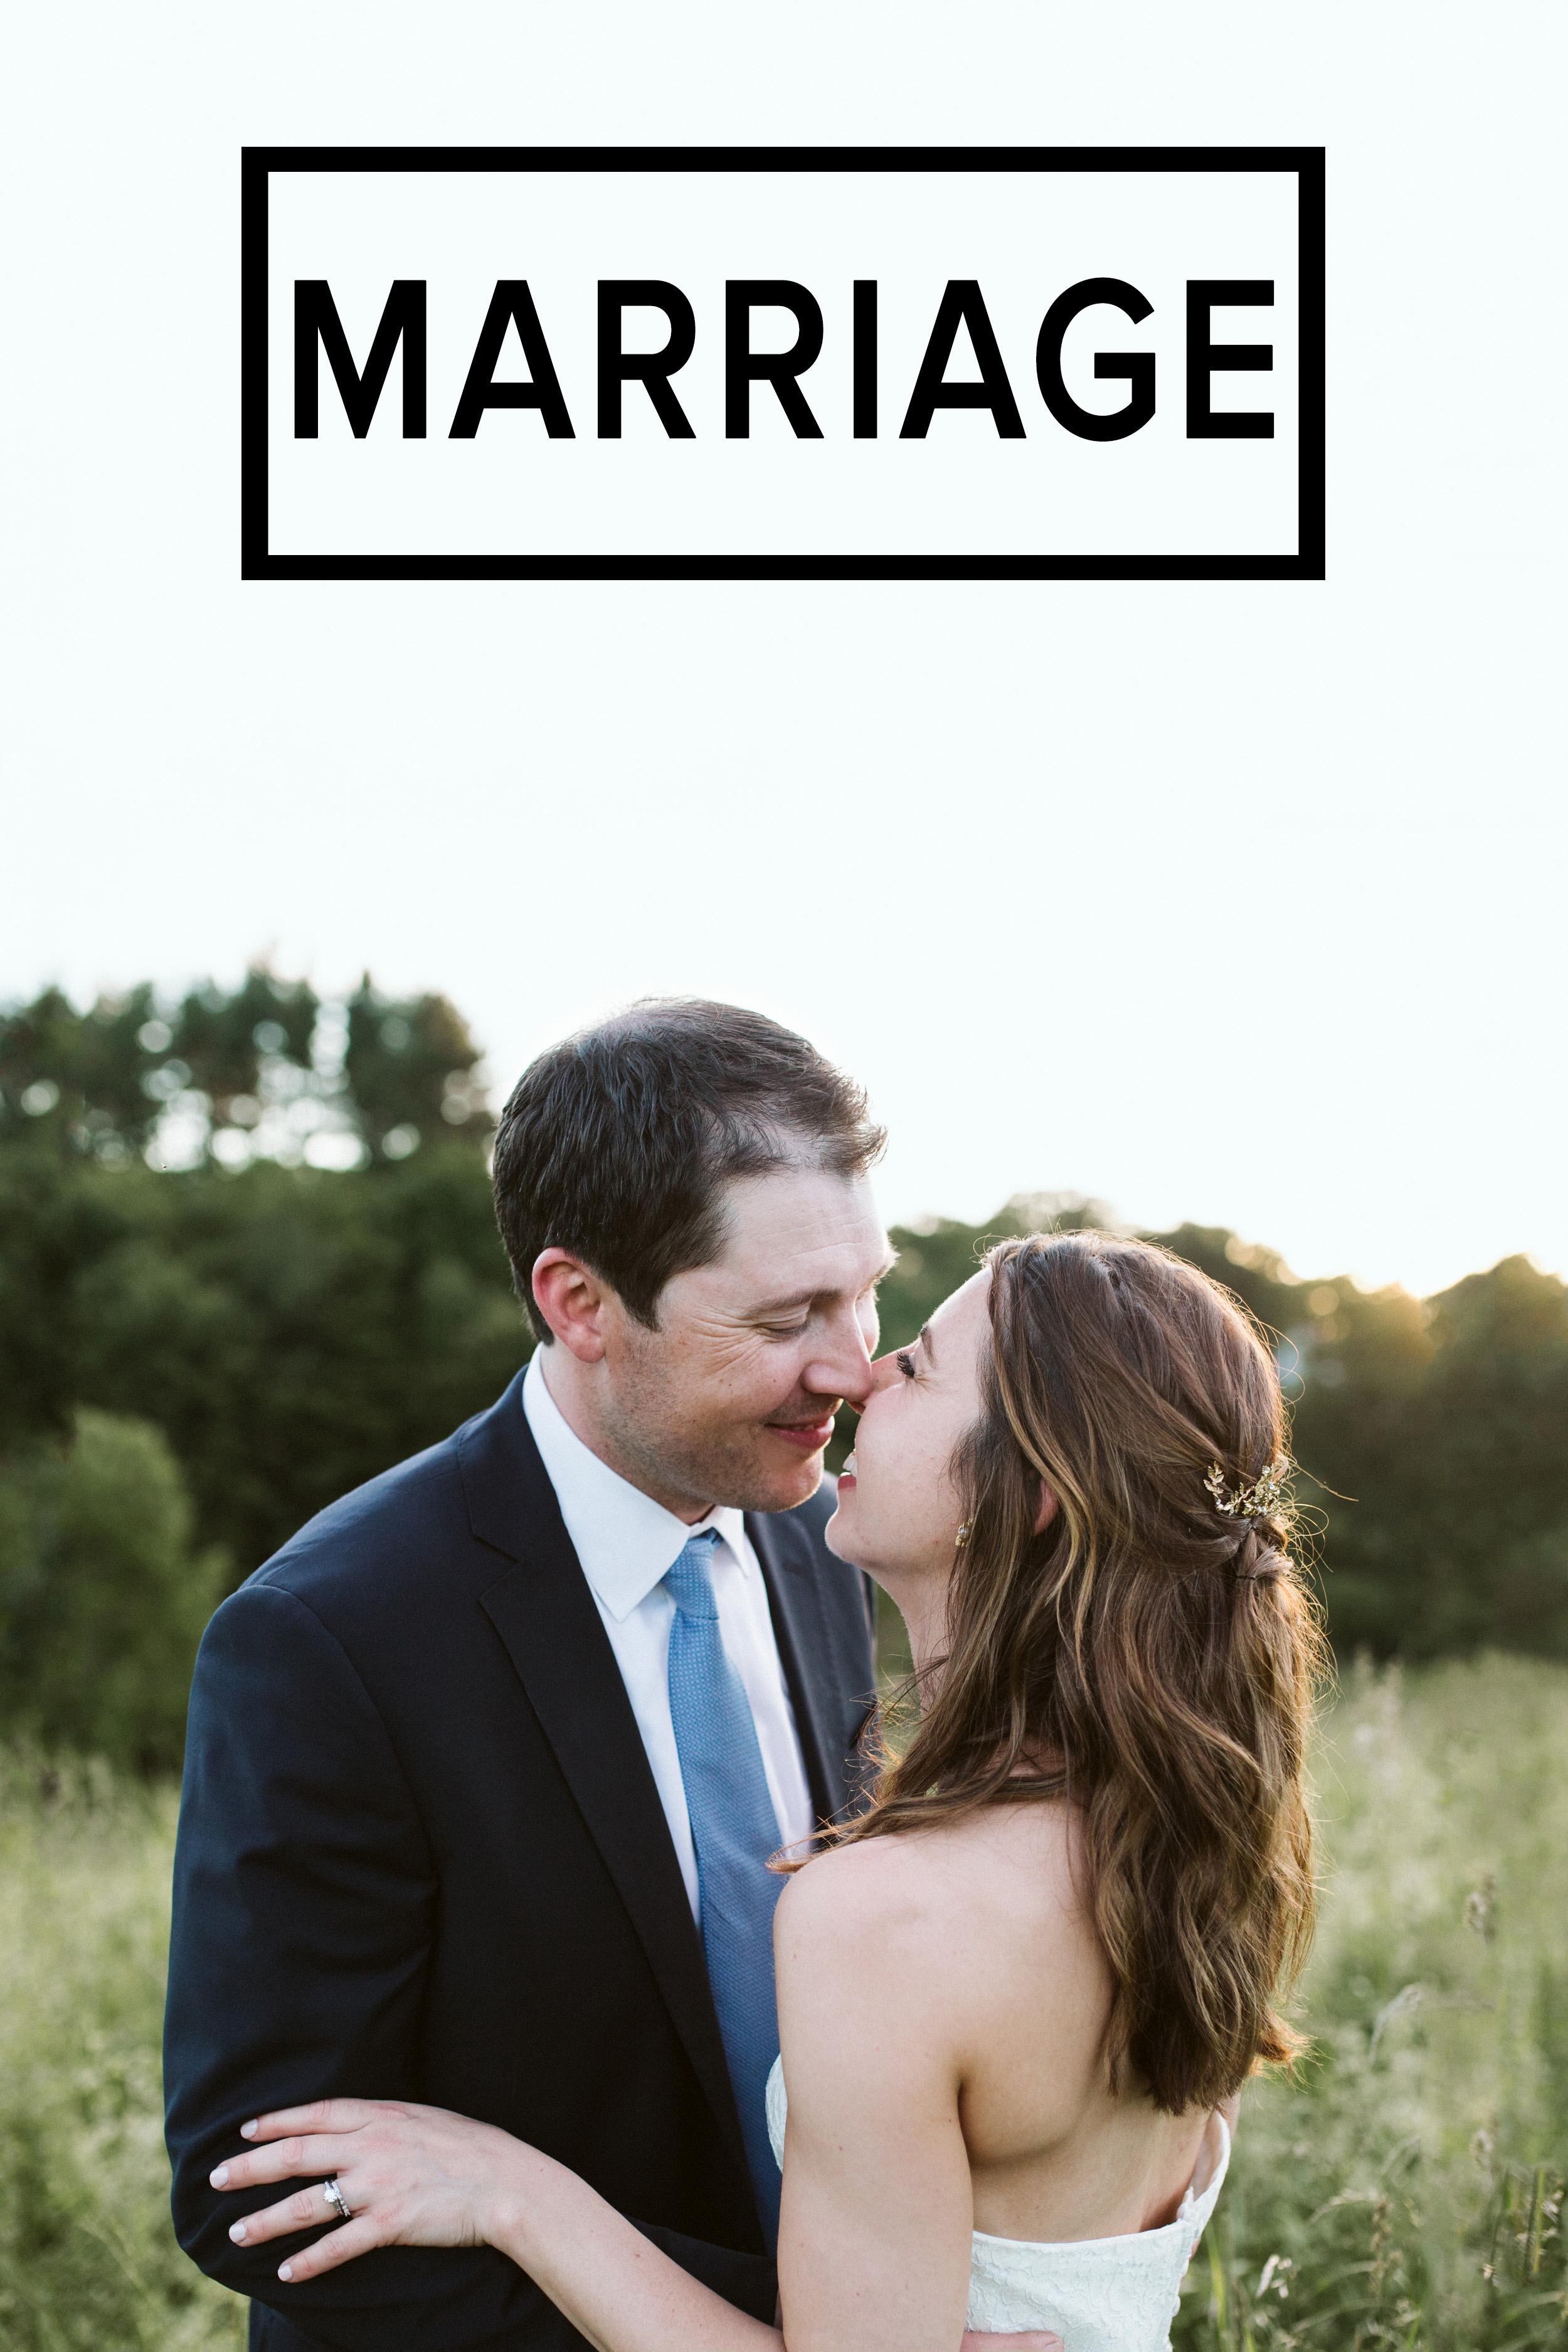 AllisonSullivan_marriage.jpg